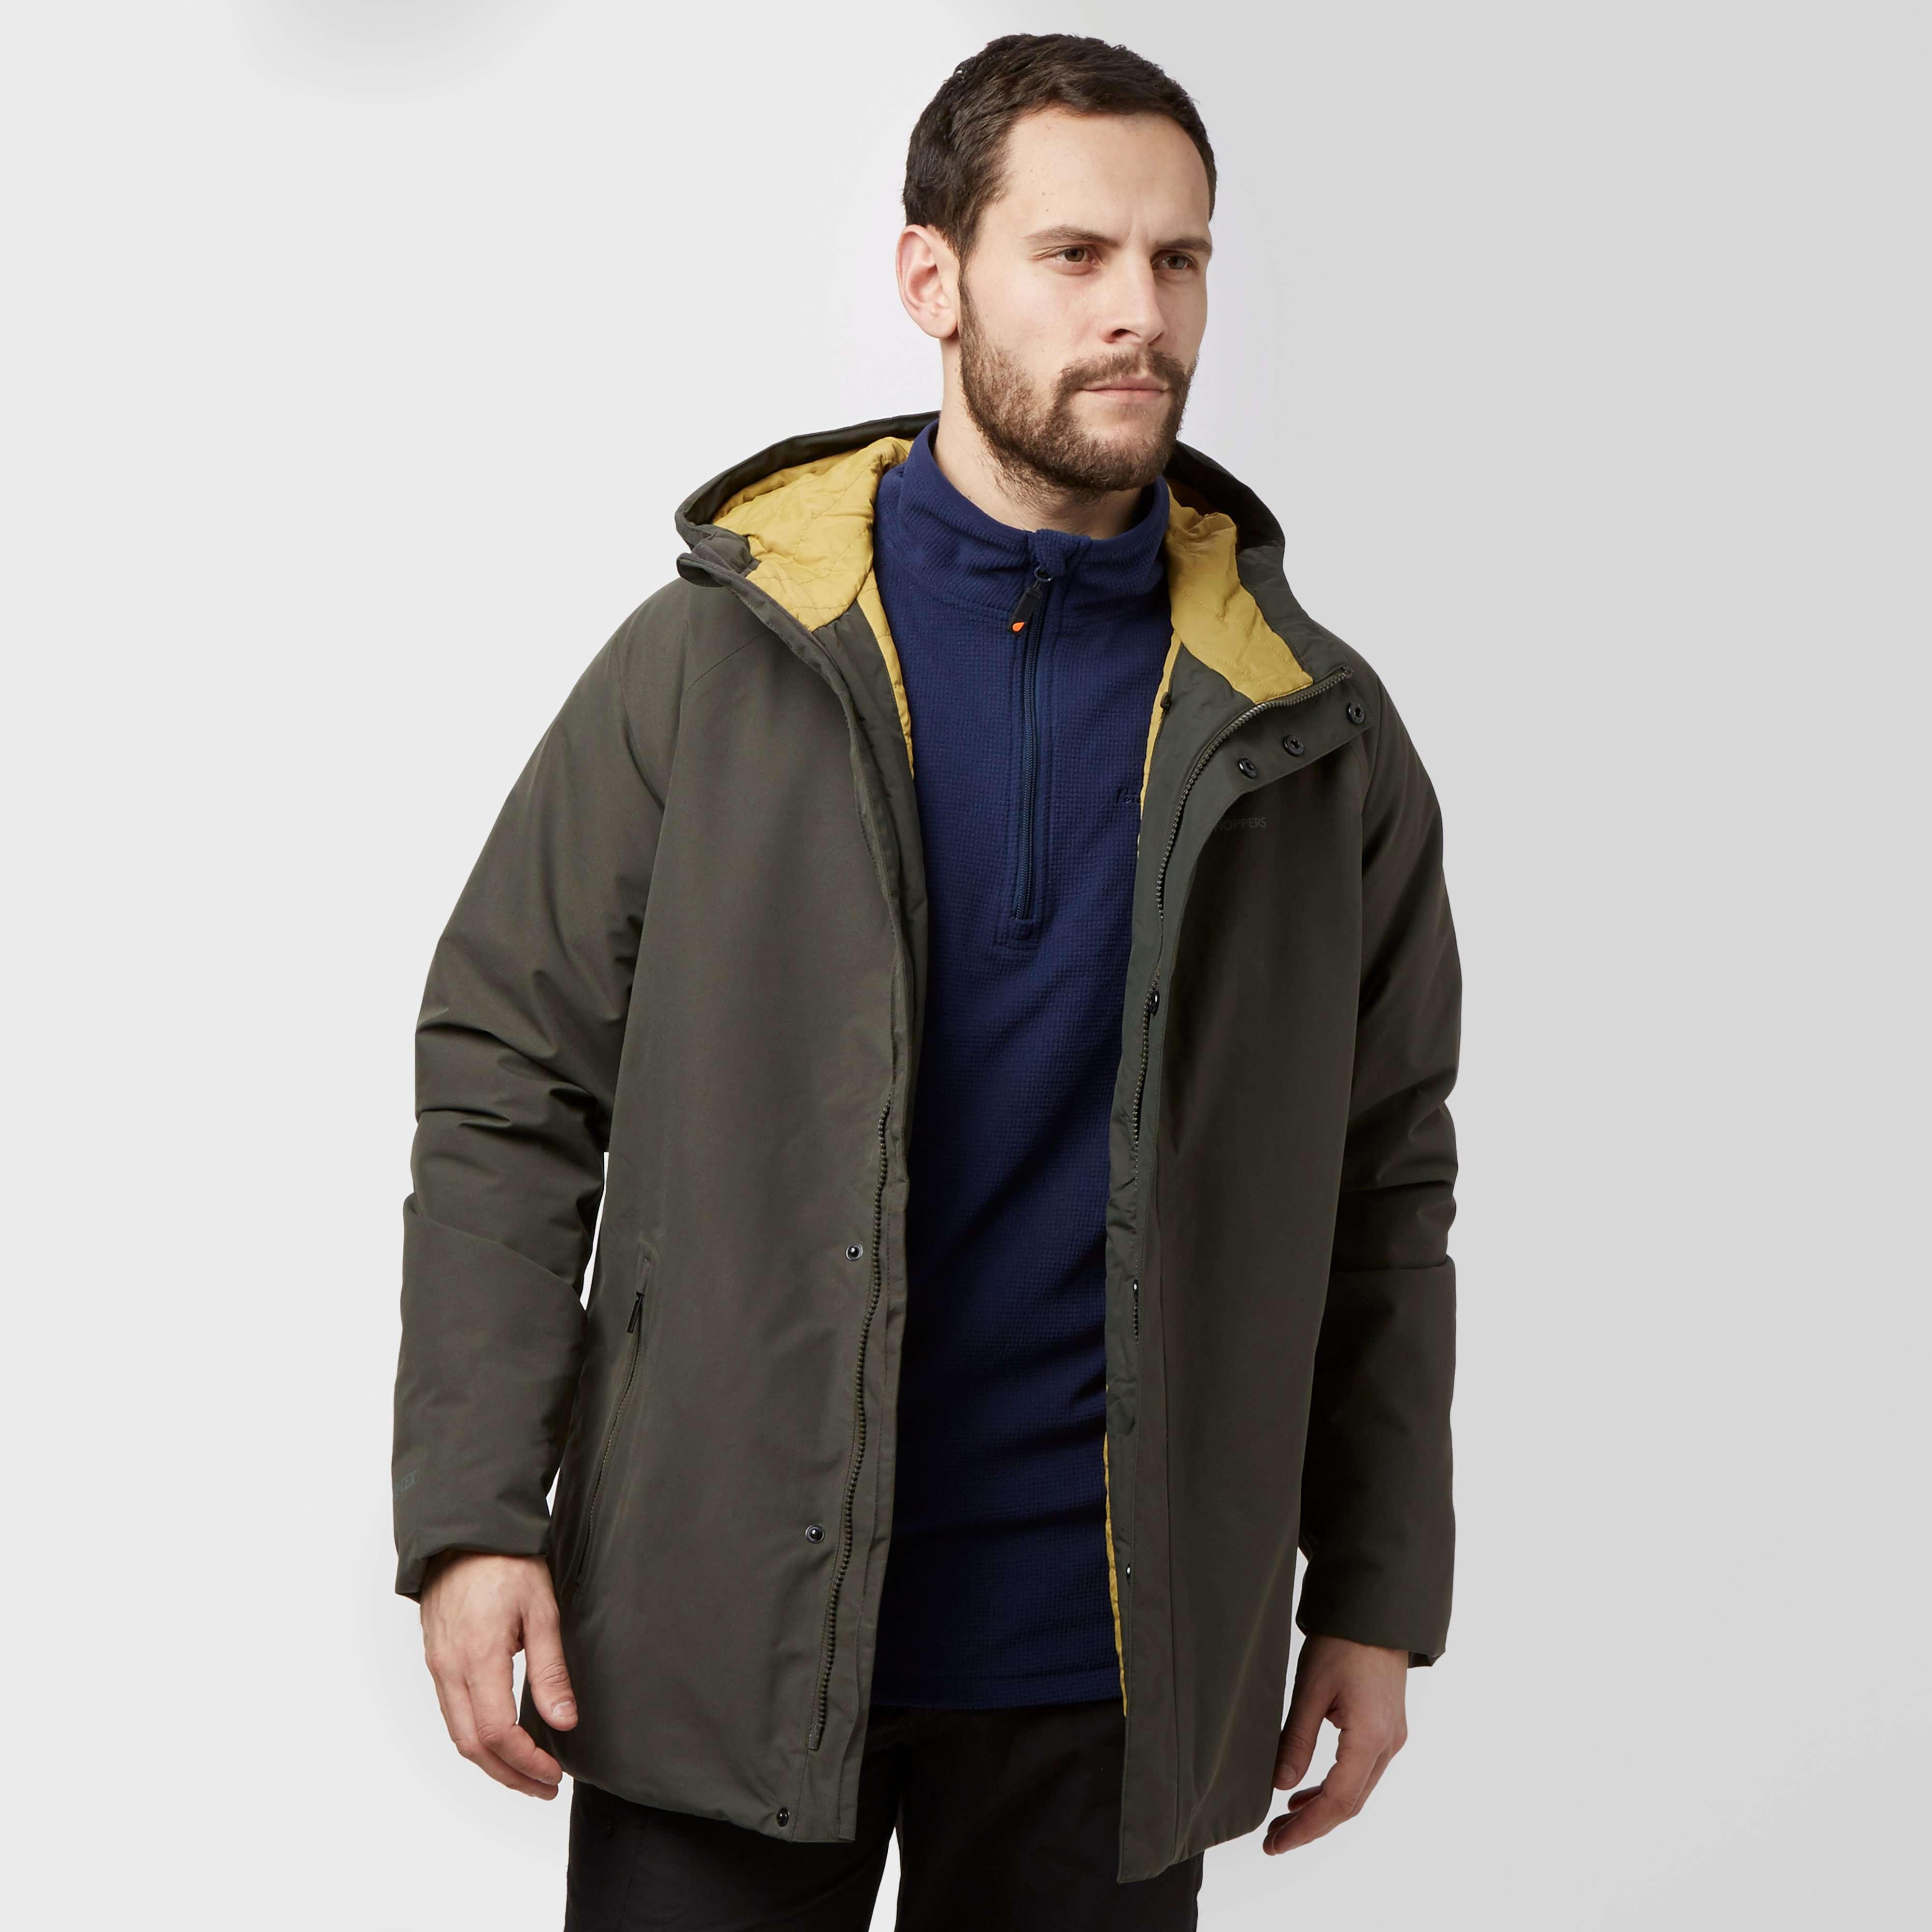 CRAGHOPPERS Men's Irvine GORE-TEX® Jacket